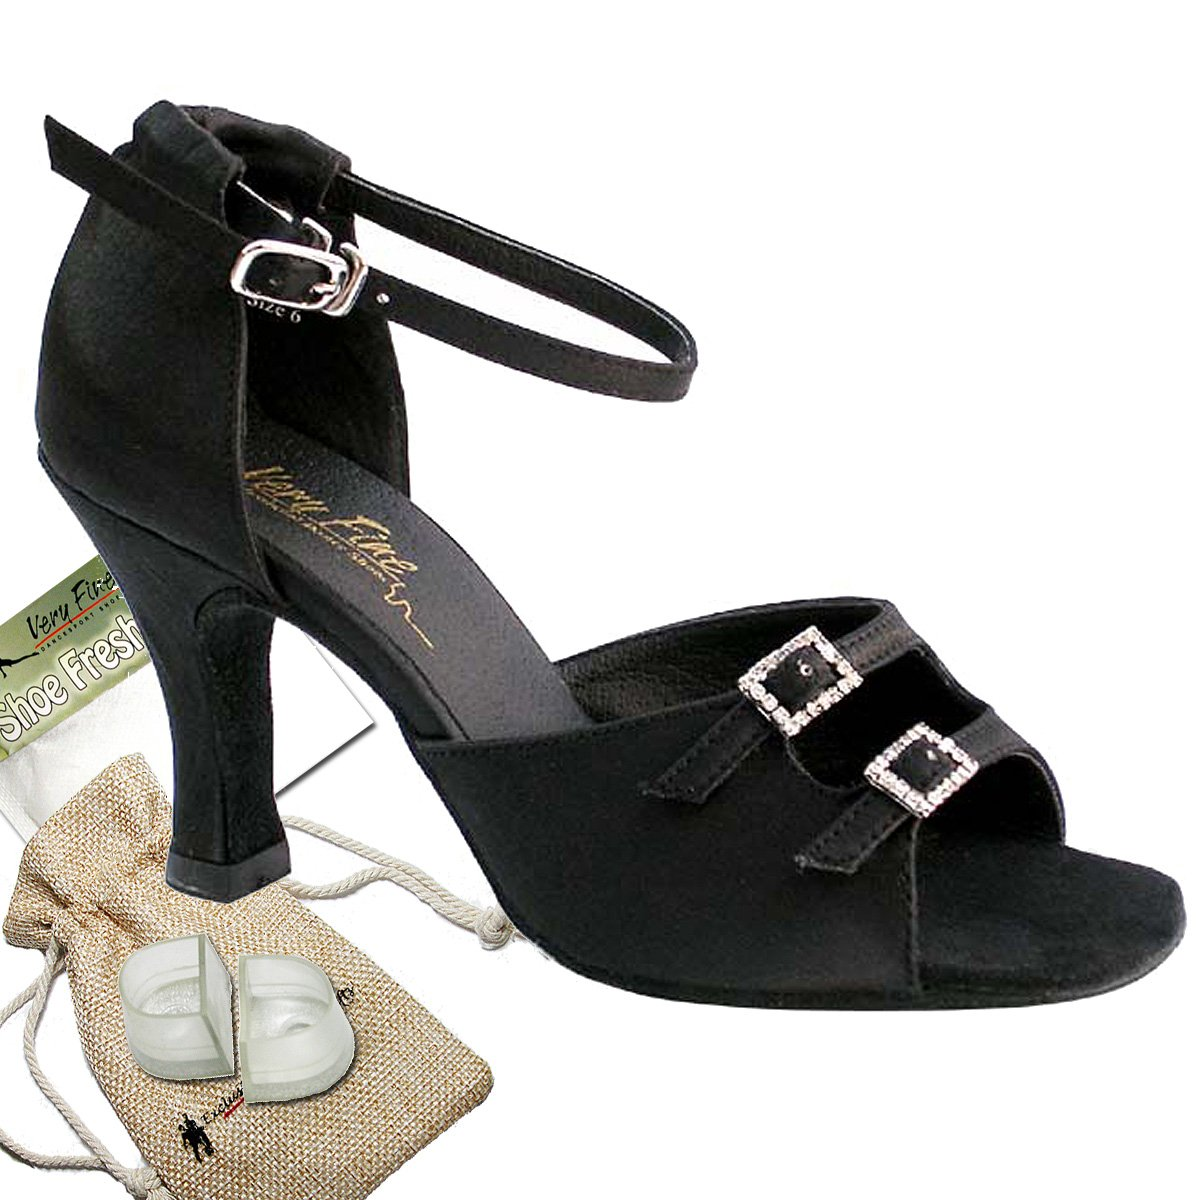 Womens Ballroom Dance Shoes Tango Wedding Party Salsa Shoes Black Satin 1620EB Comfortable - Very Fine 2.5'' Heel 9.5 M US [Bundle of 5]